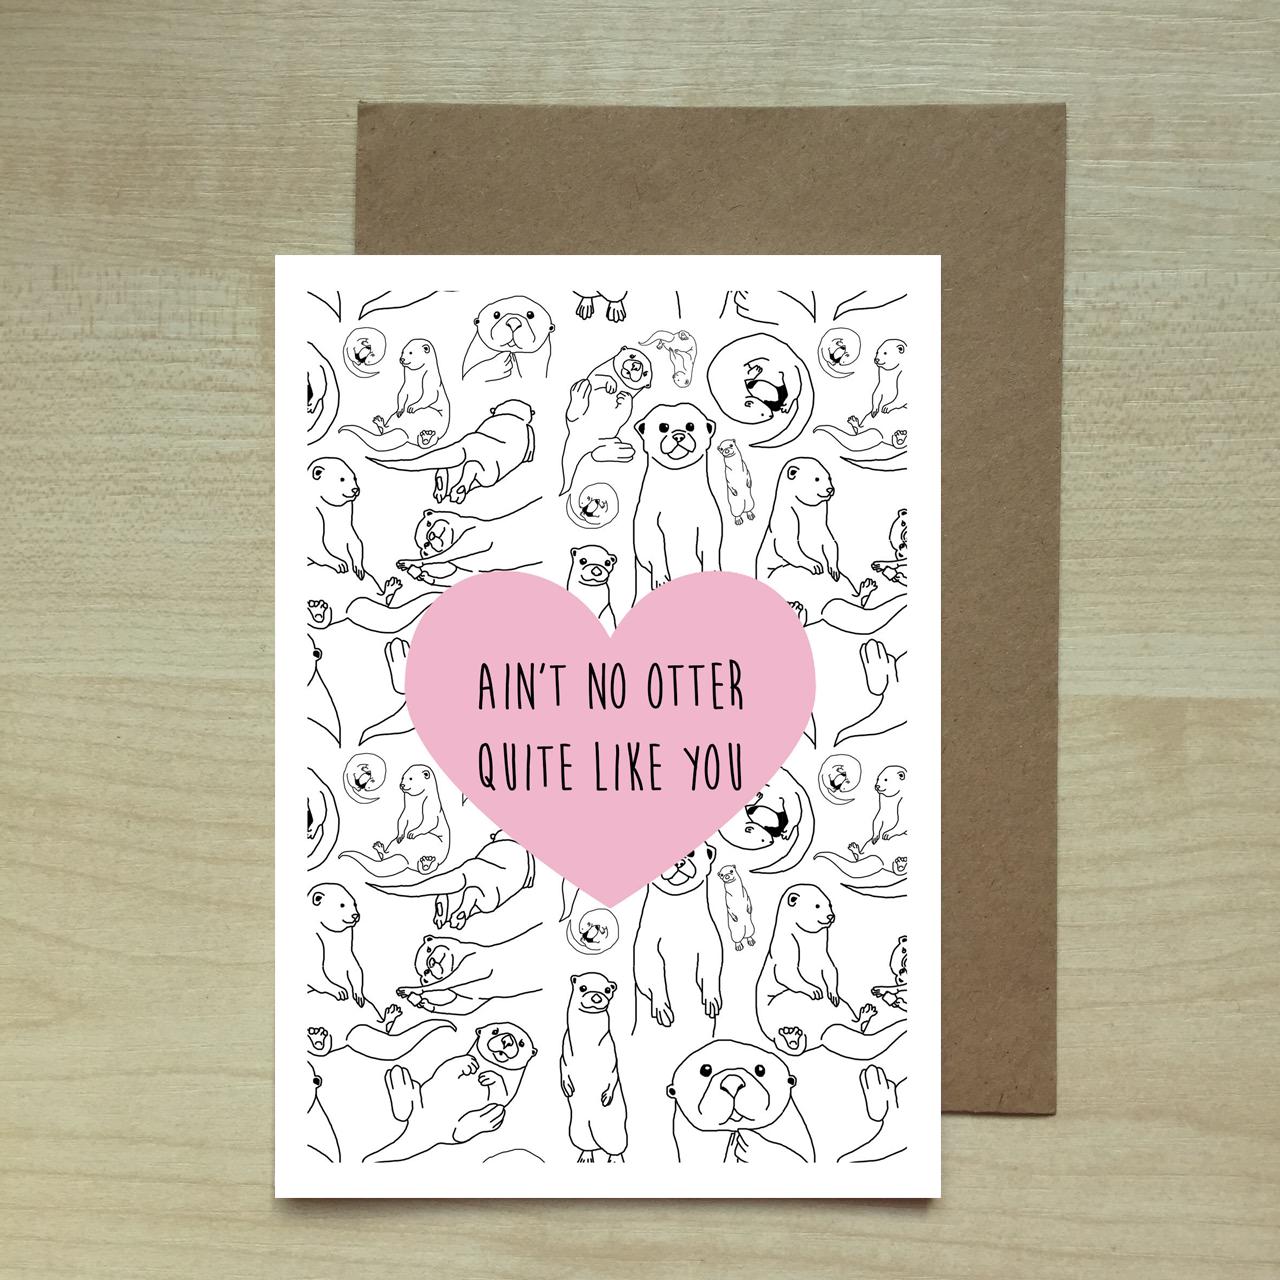 Jennifer Spooner - My Greeting Cards